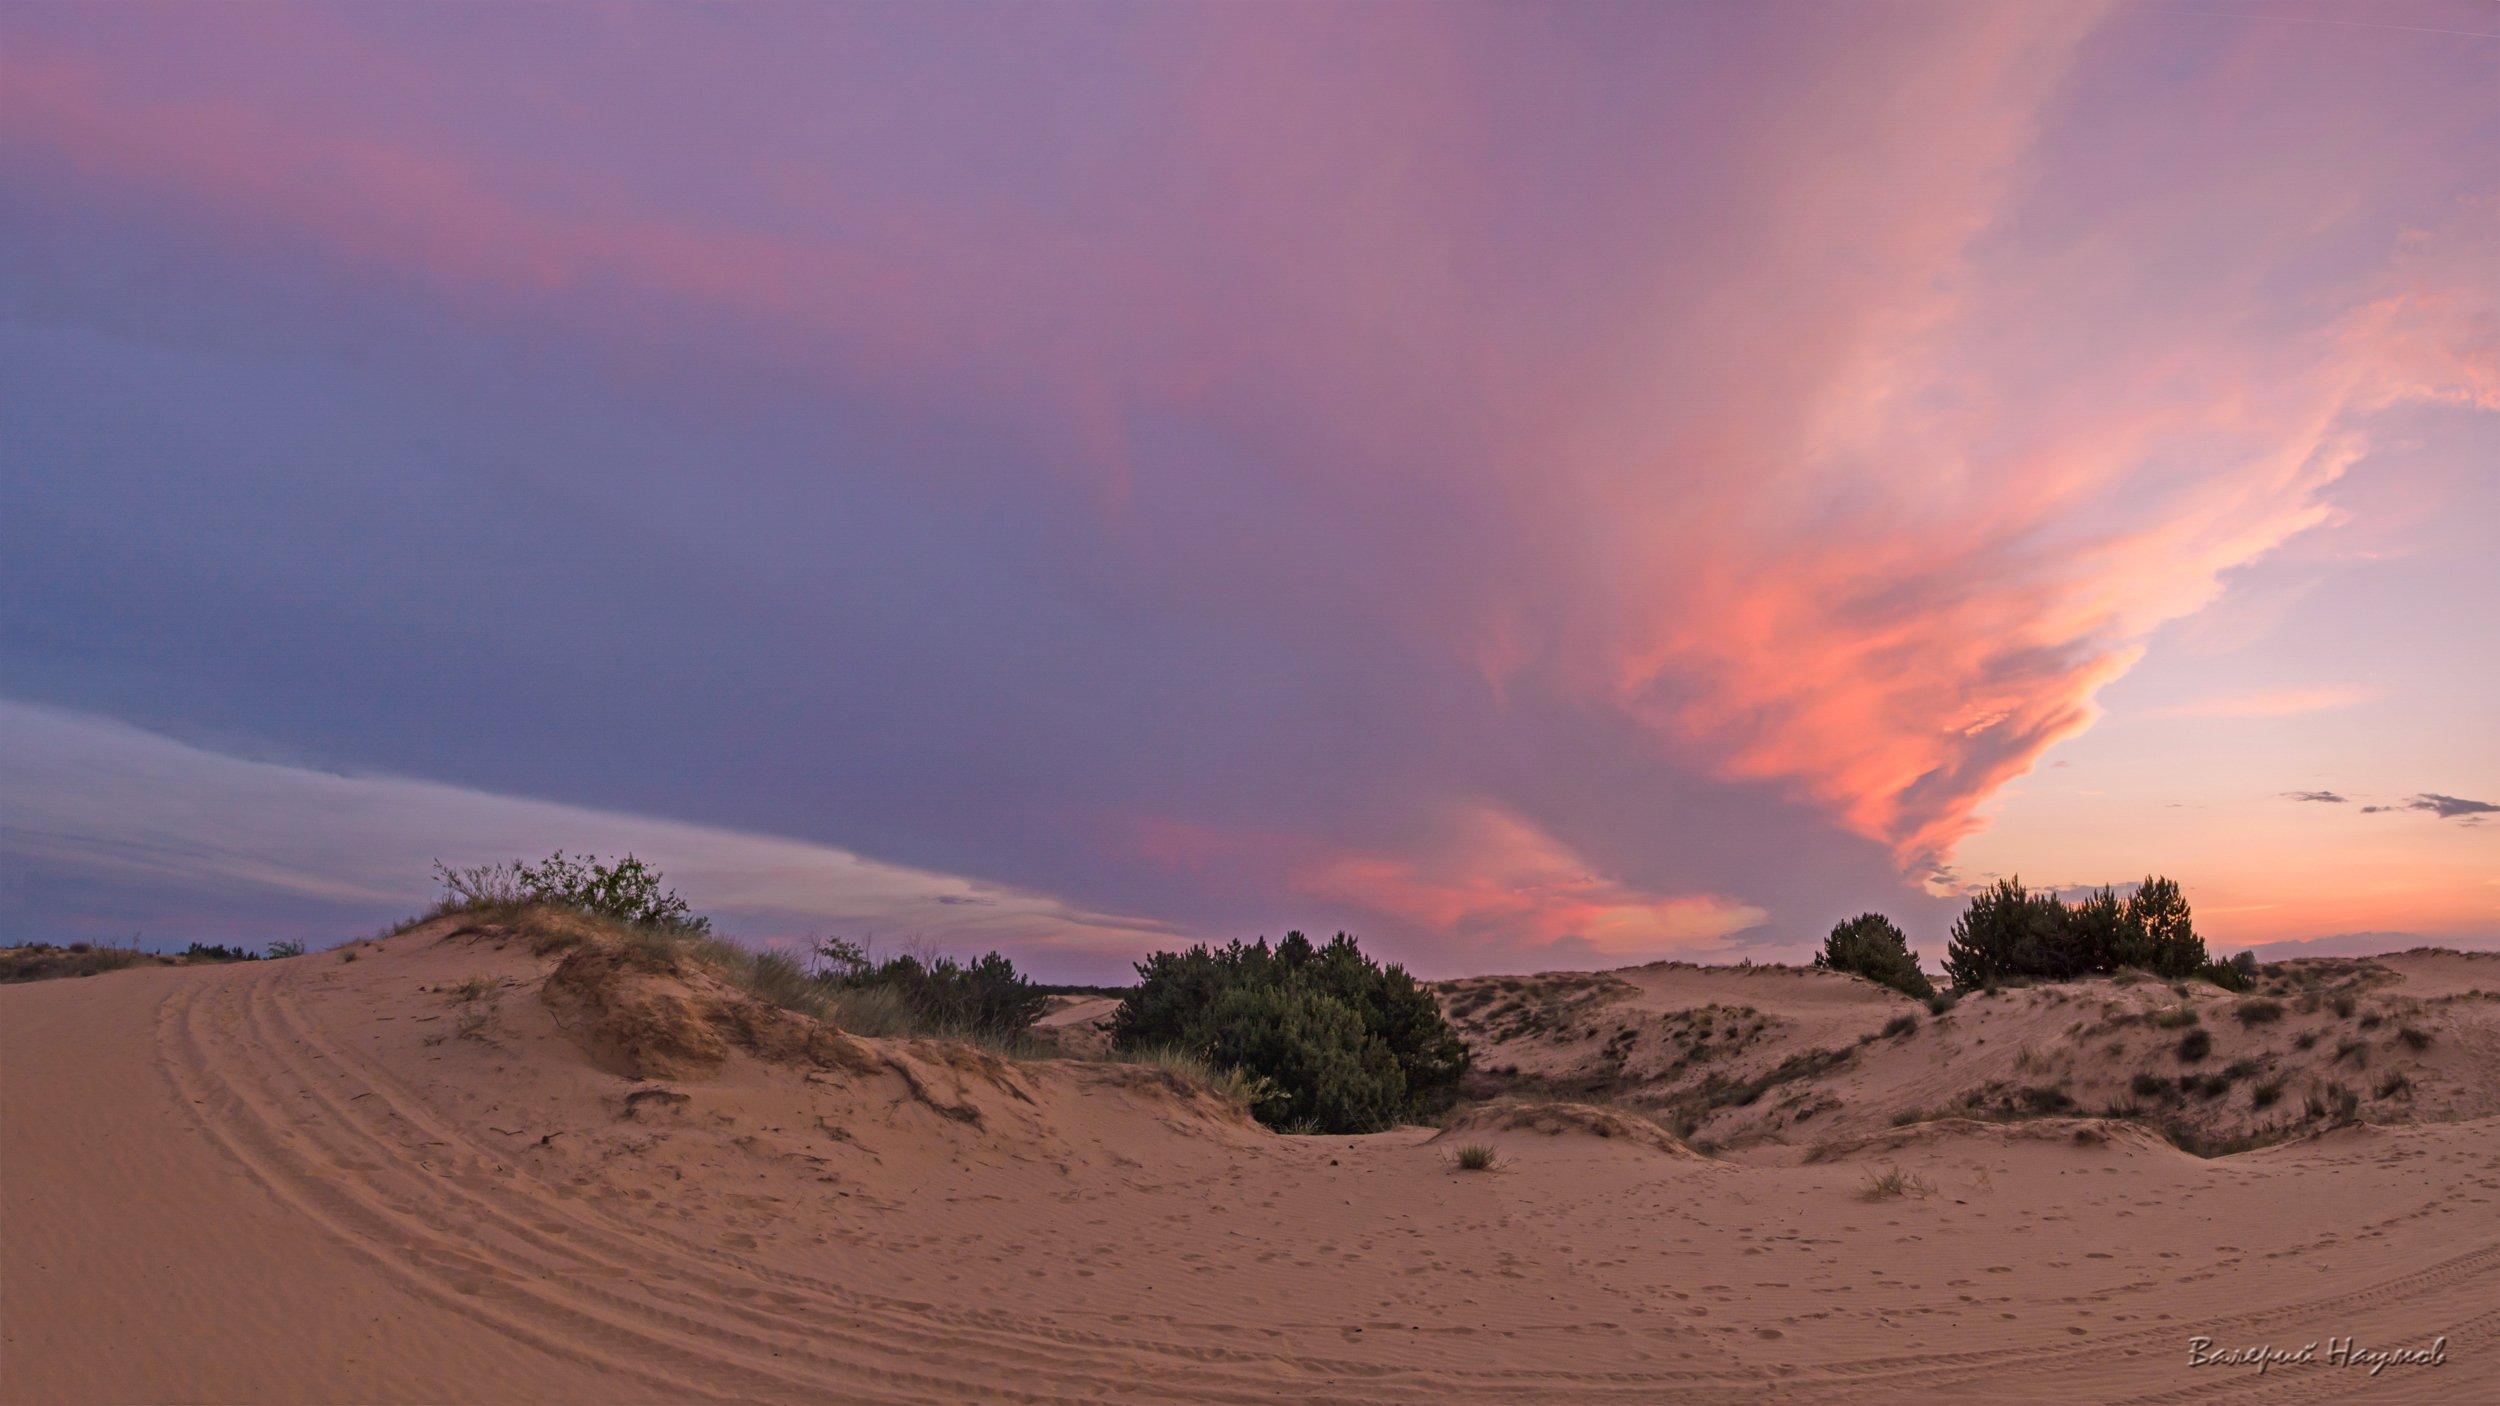 вечер, июнь, закат, небо, облака, Валерий Наумов